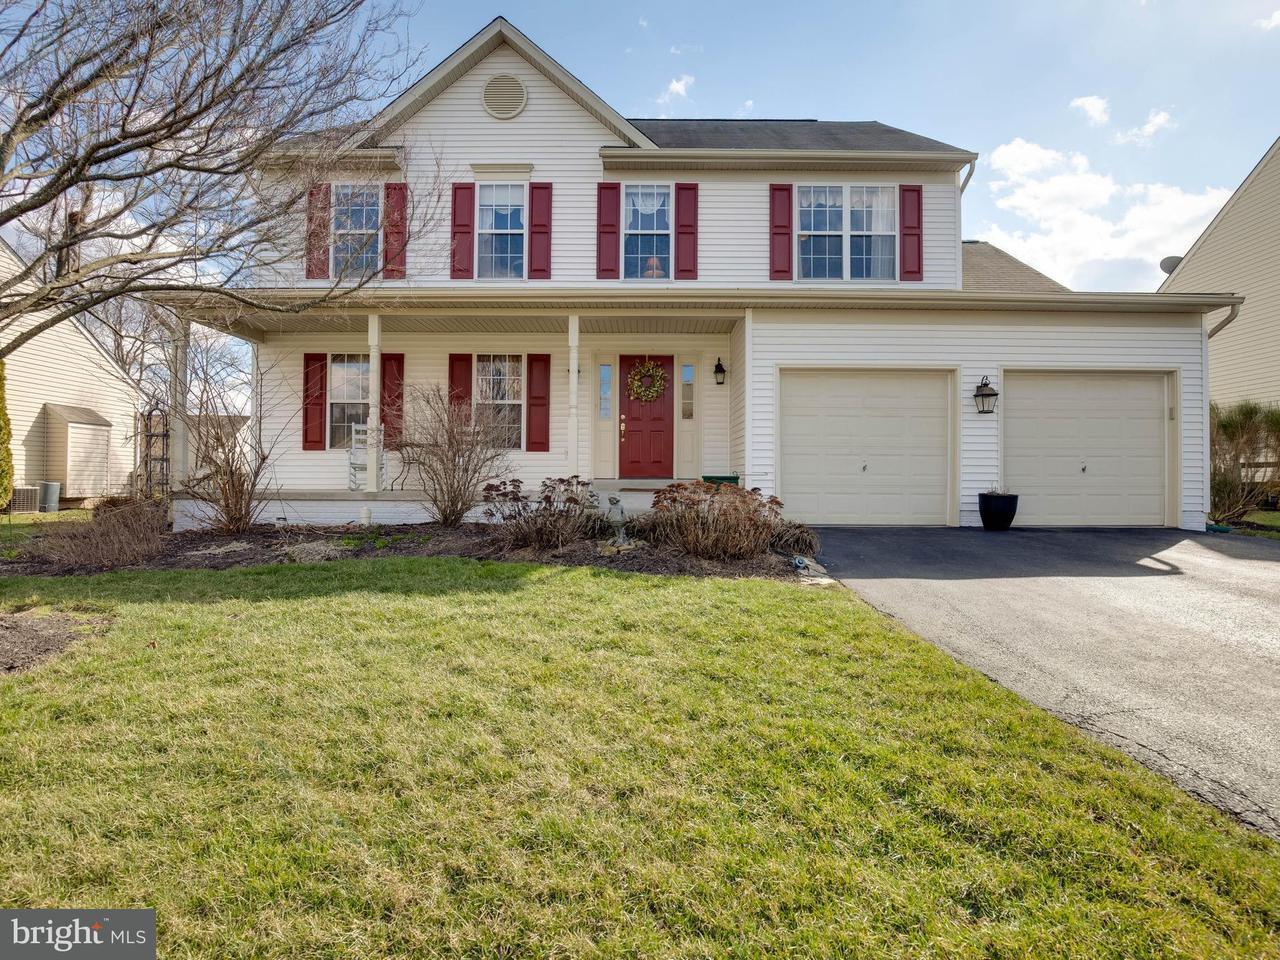 獨棟家庭住宅 為 出售 在 5749 Morland Dr S 5749 Morland Dr S Adamstown, 馬里蘭州 21710 美國